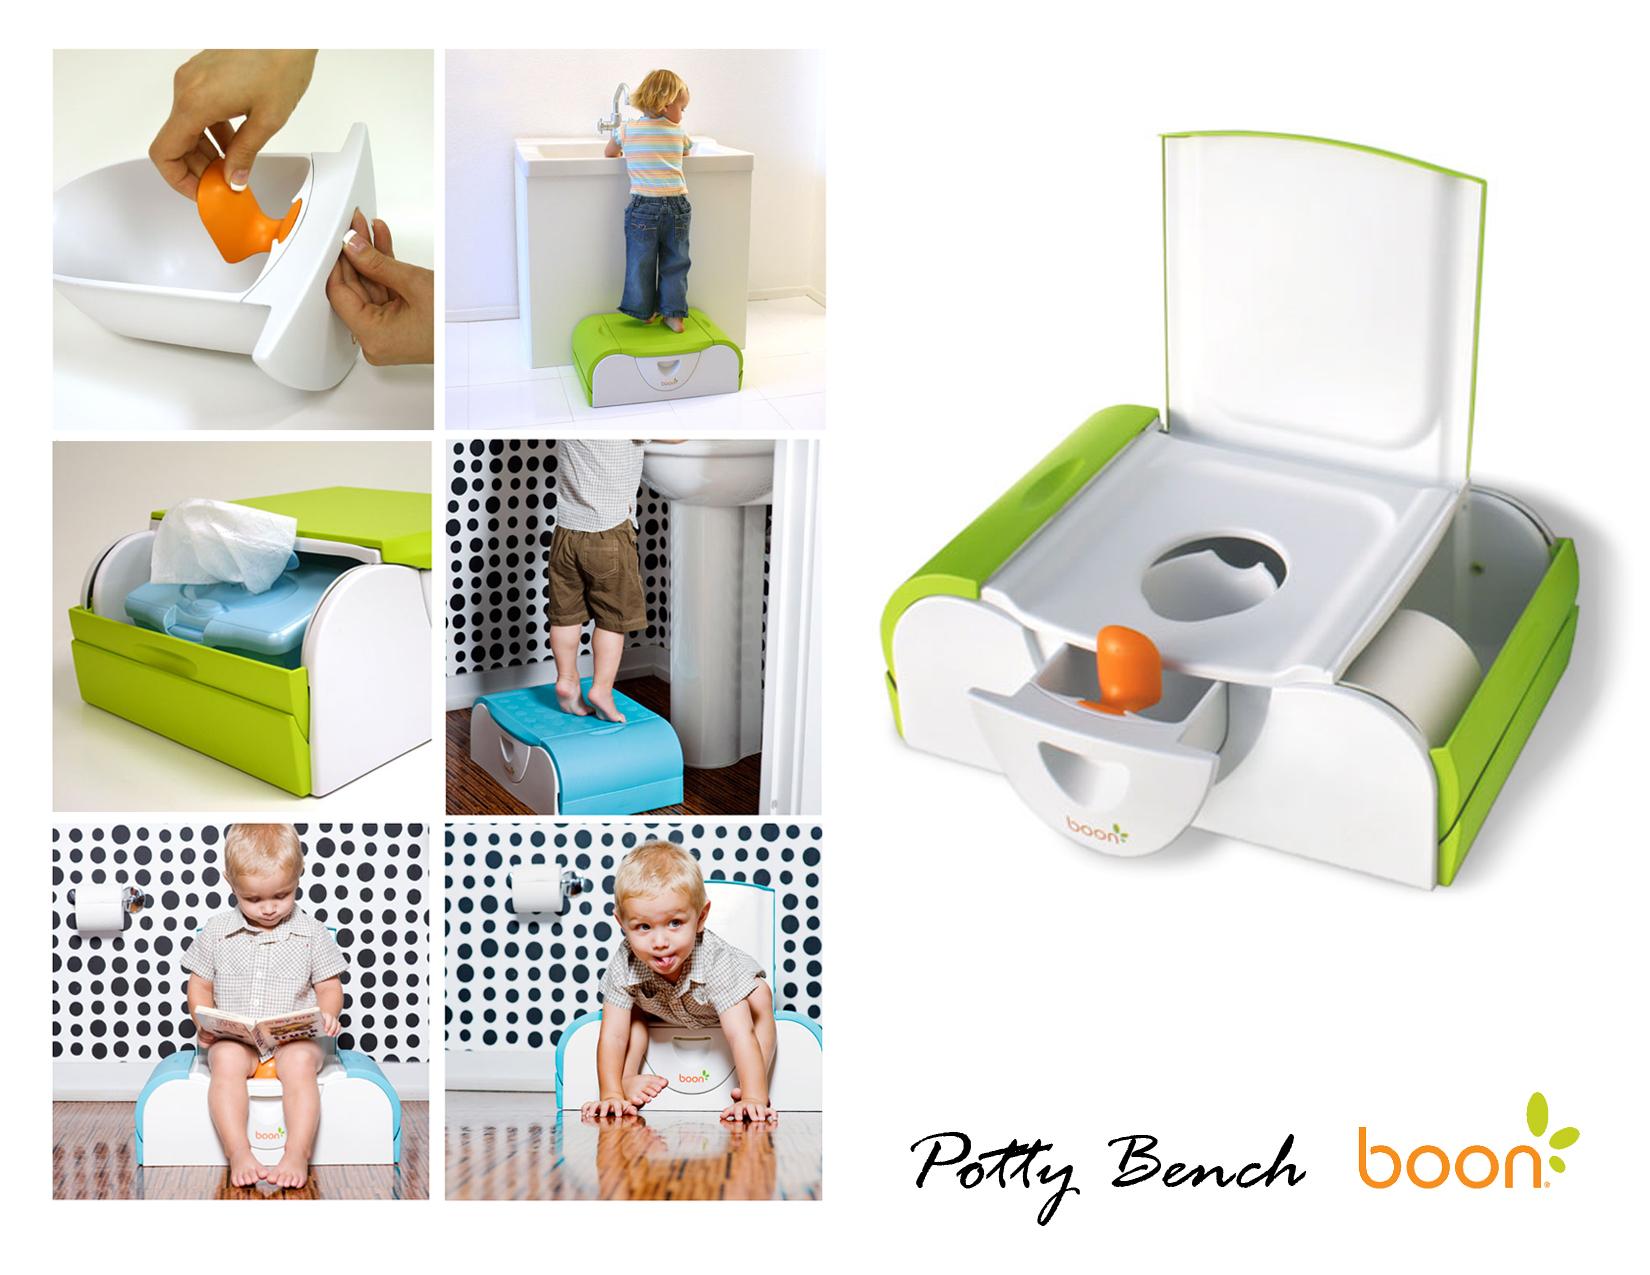 boon potty bench by t j manion at coroflotcom - share